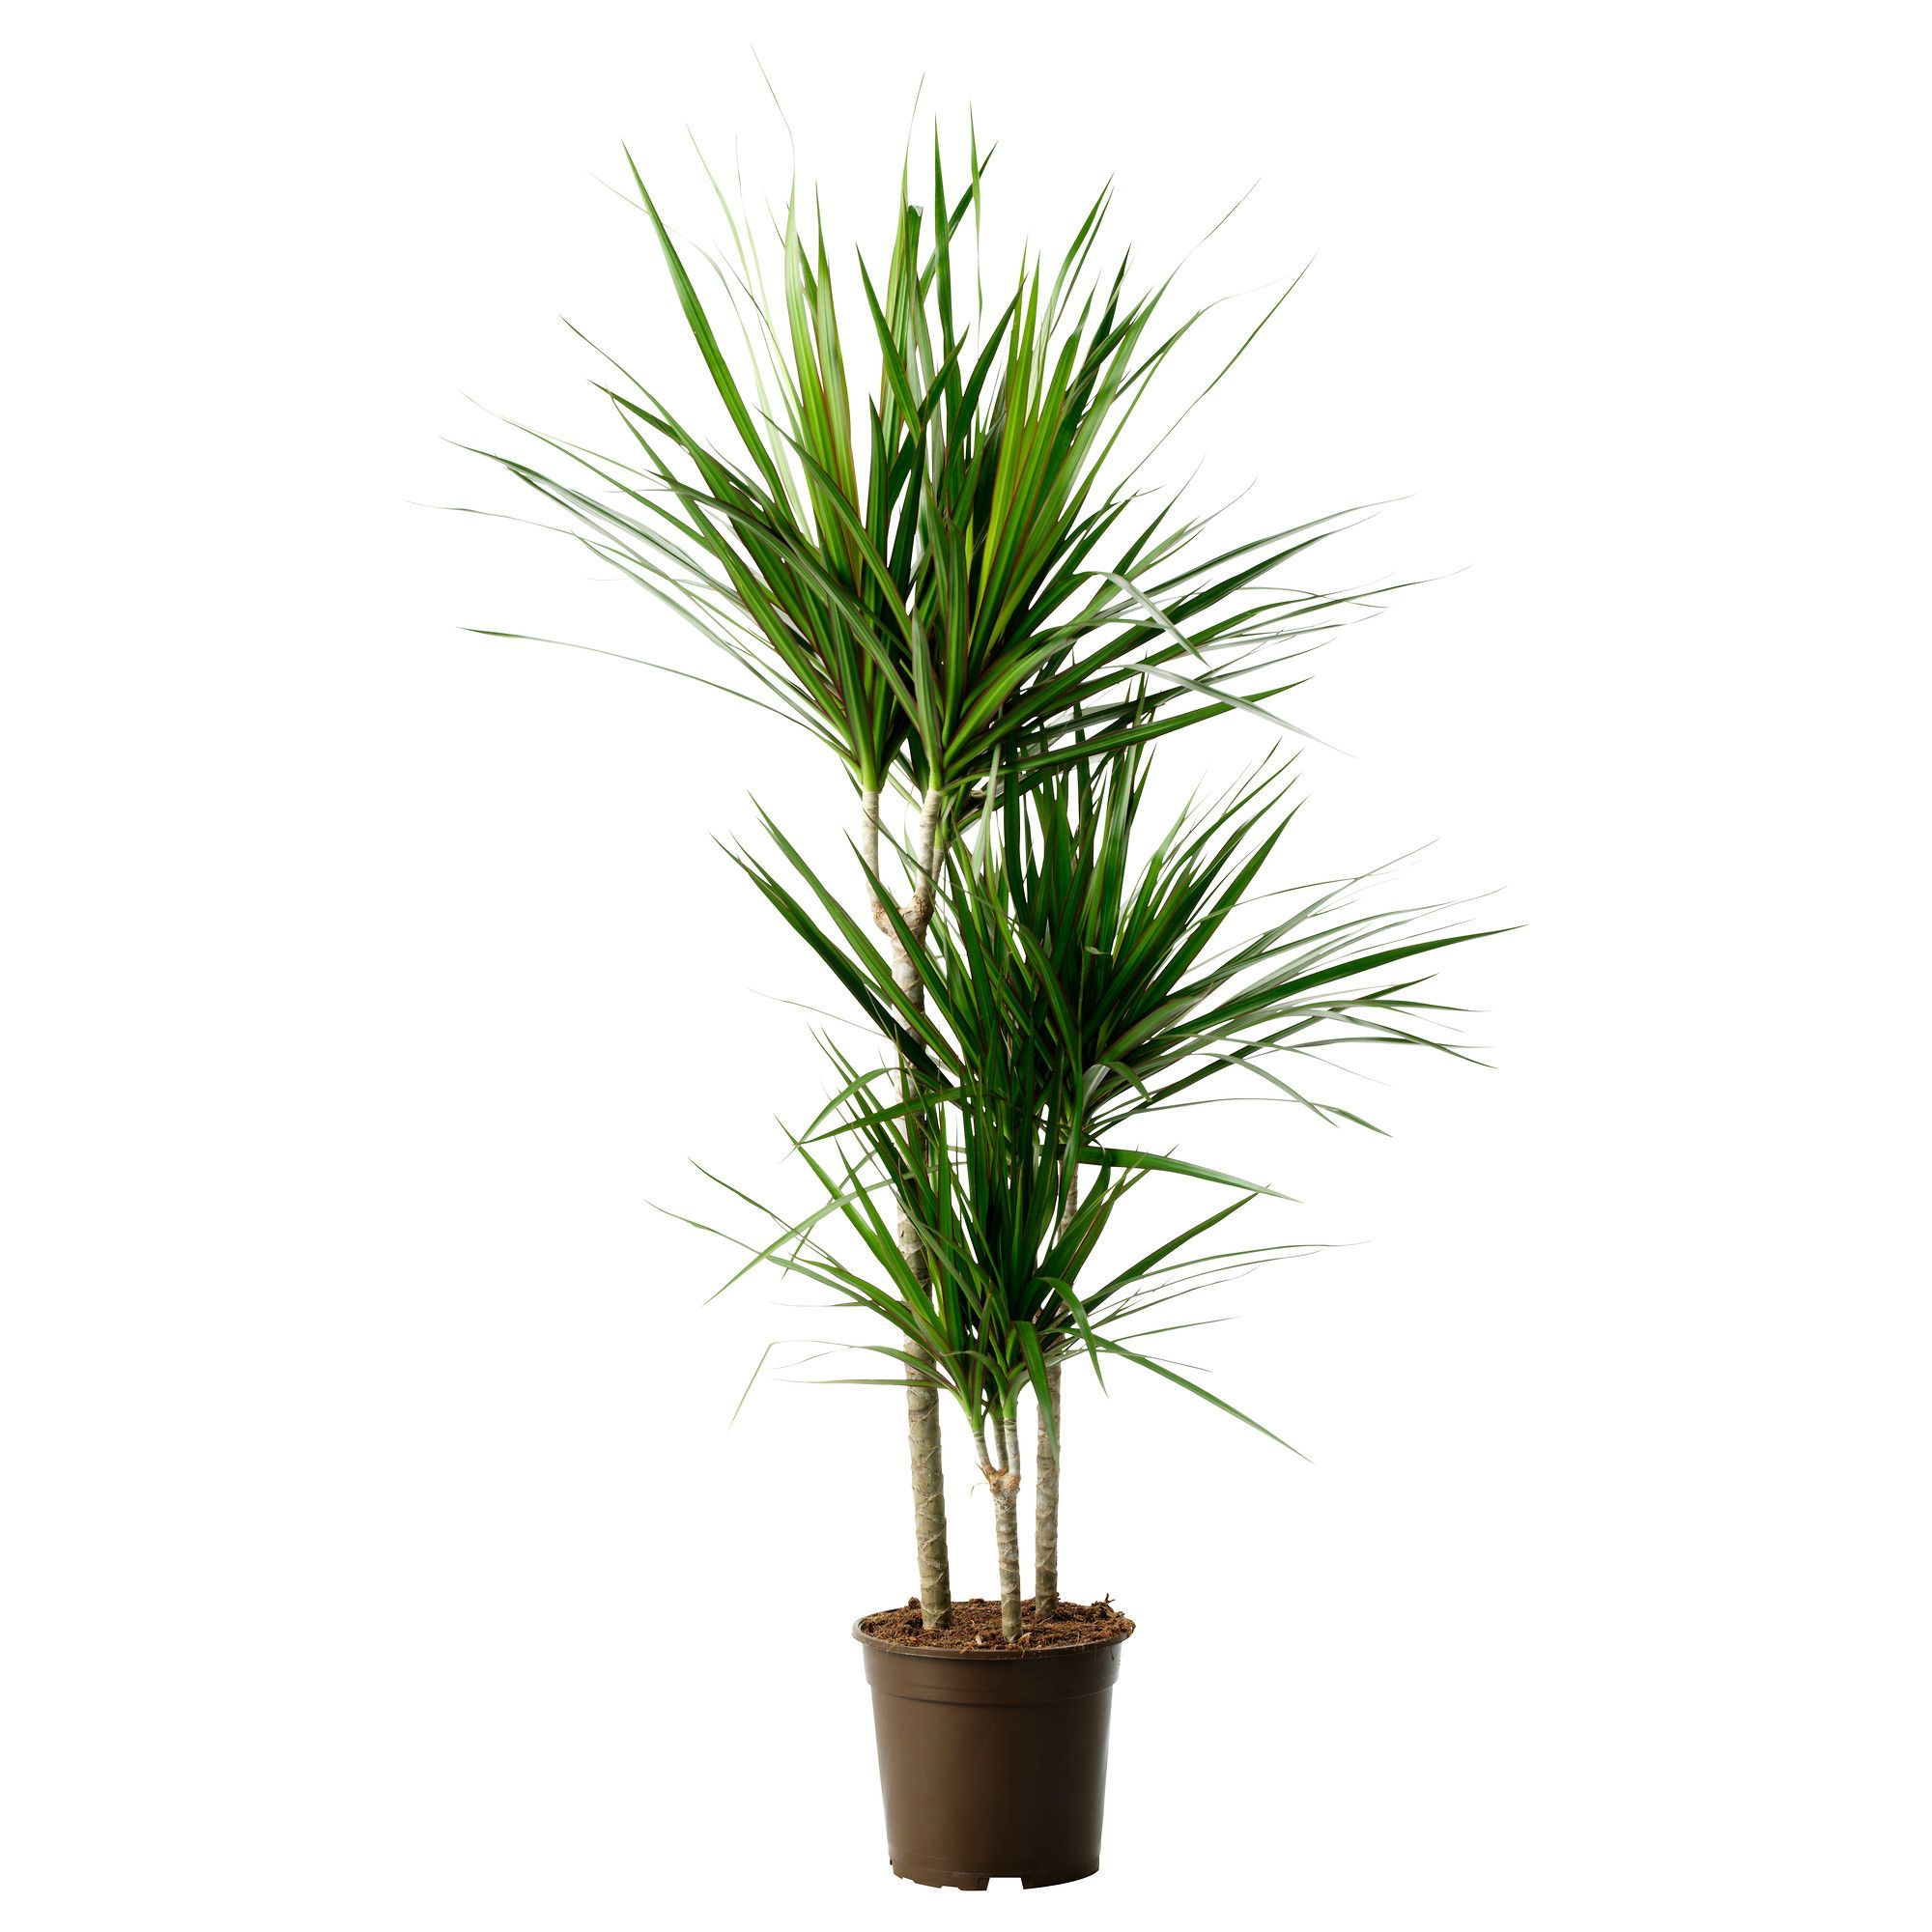 Us Furniture And Home Furnishings Ikea Plants Dracaena Plant